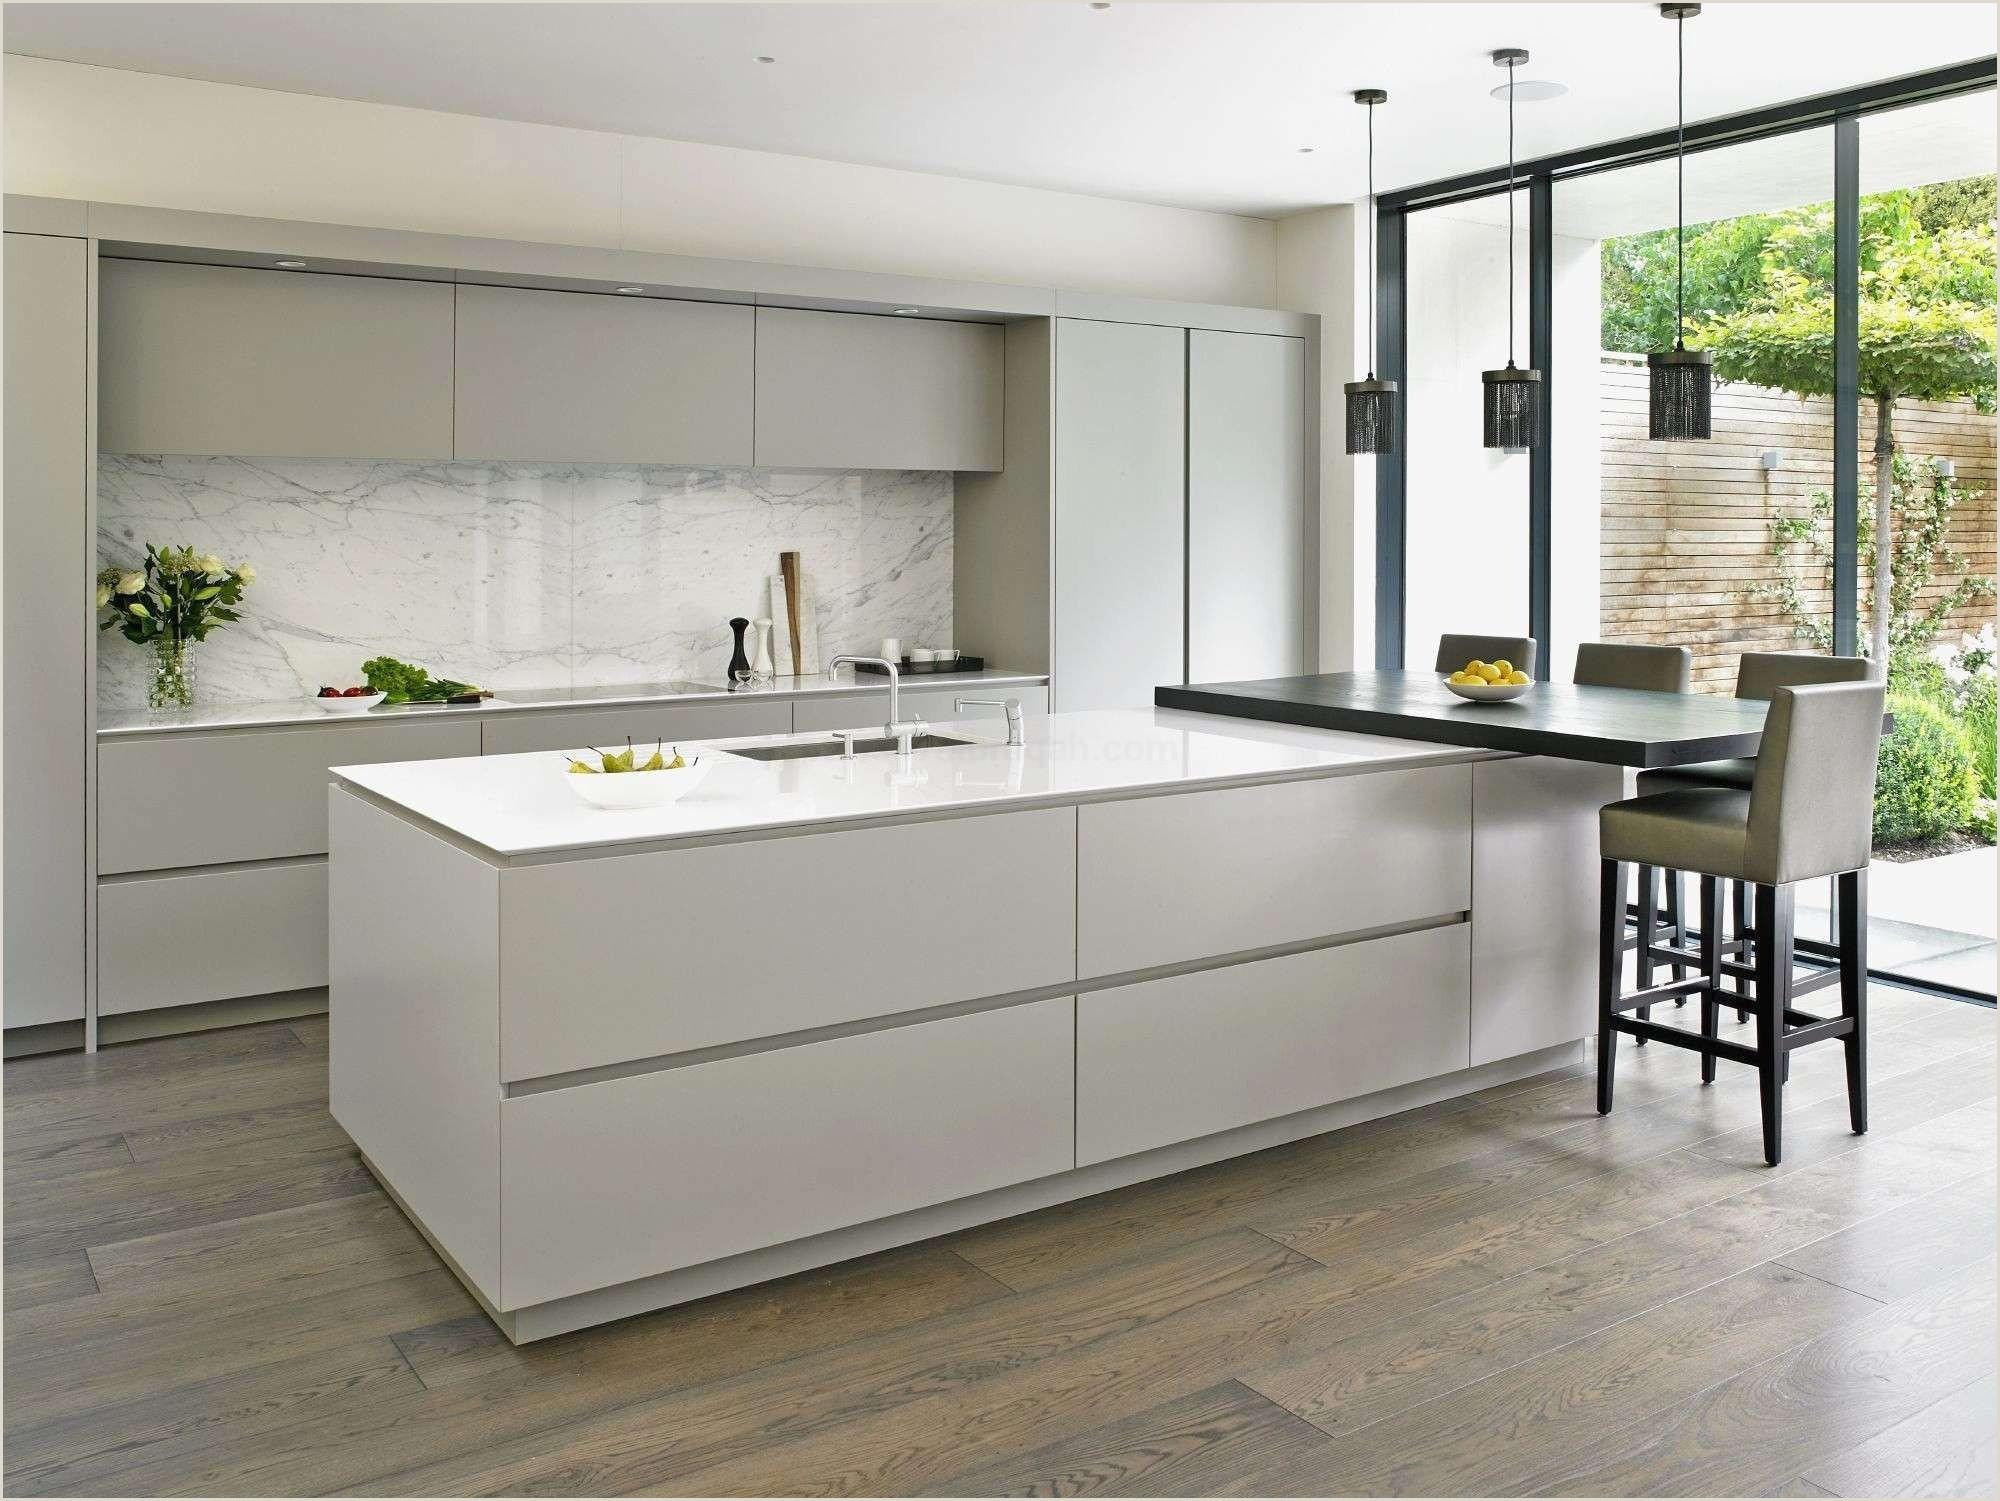 Cool Designs For Cards Cool Sleek White Tiled Kitchen Floors — Modern Design